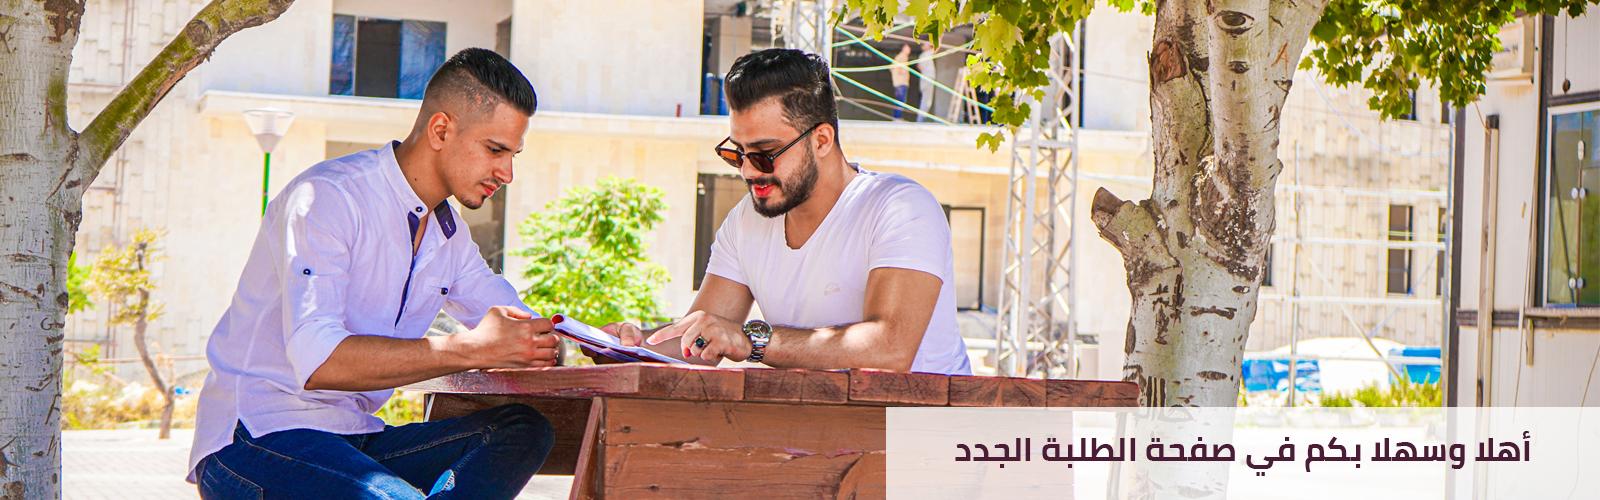 Palestine Polytechnic University (PPU) - أهلا وسهلا بكم في صفحة الطلبة الجدد